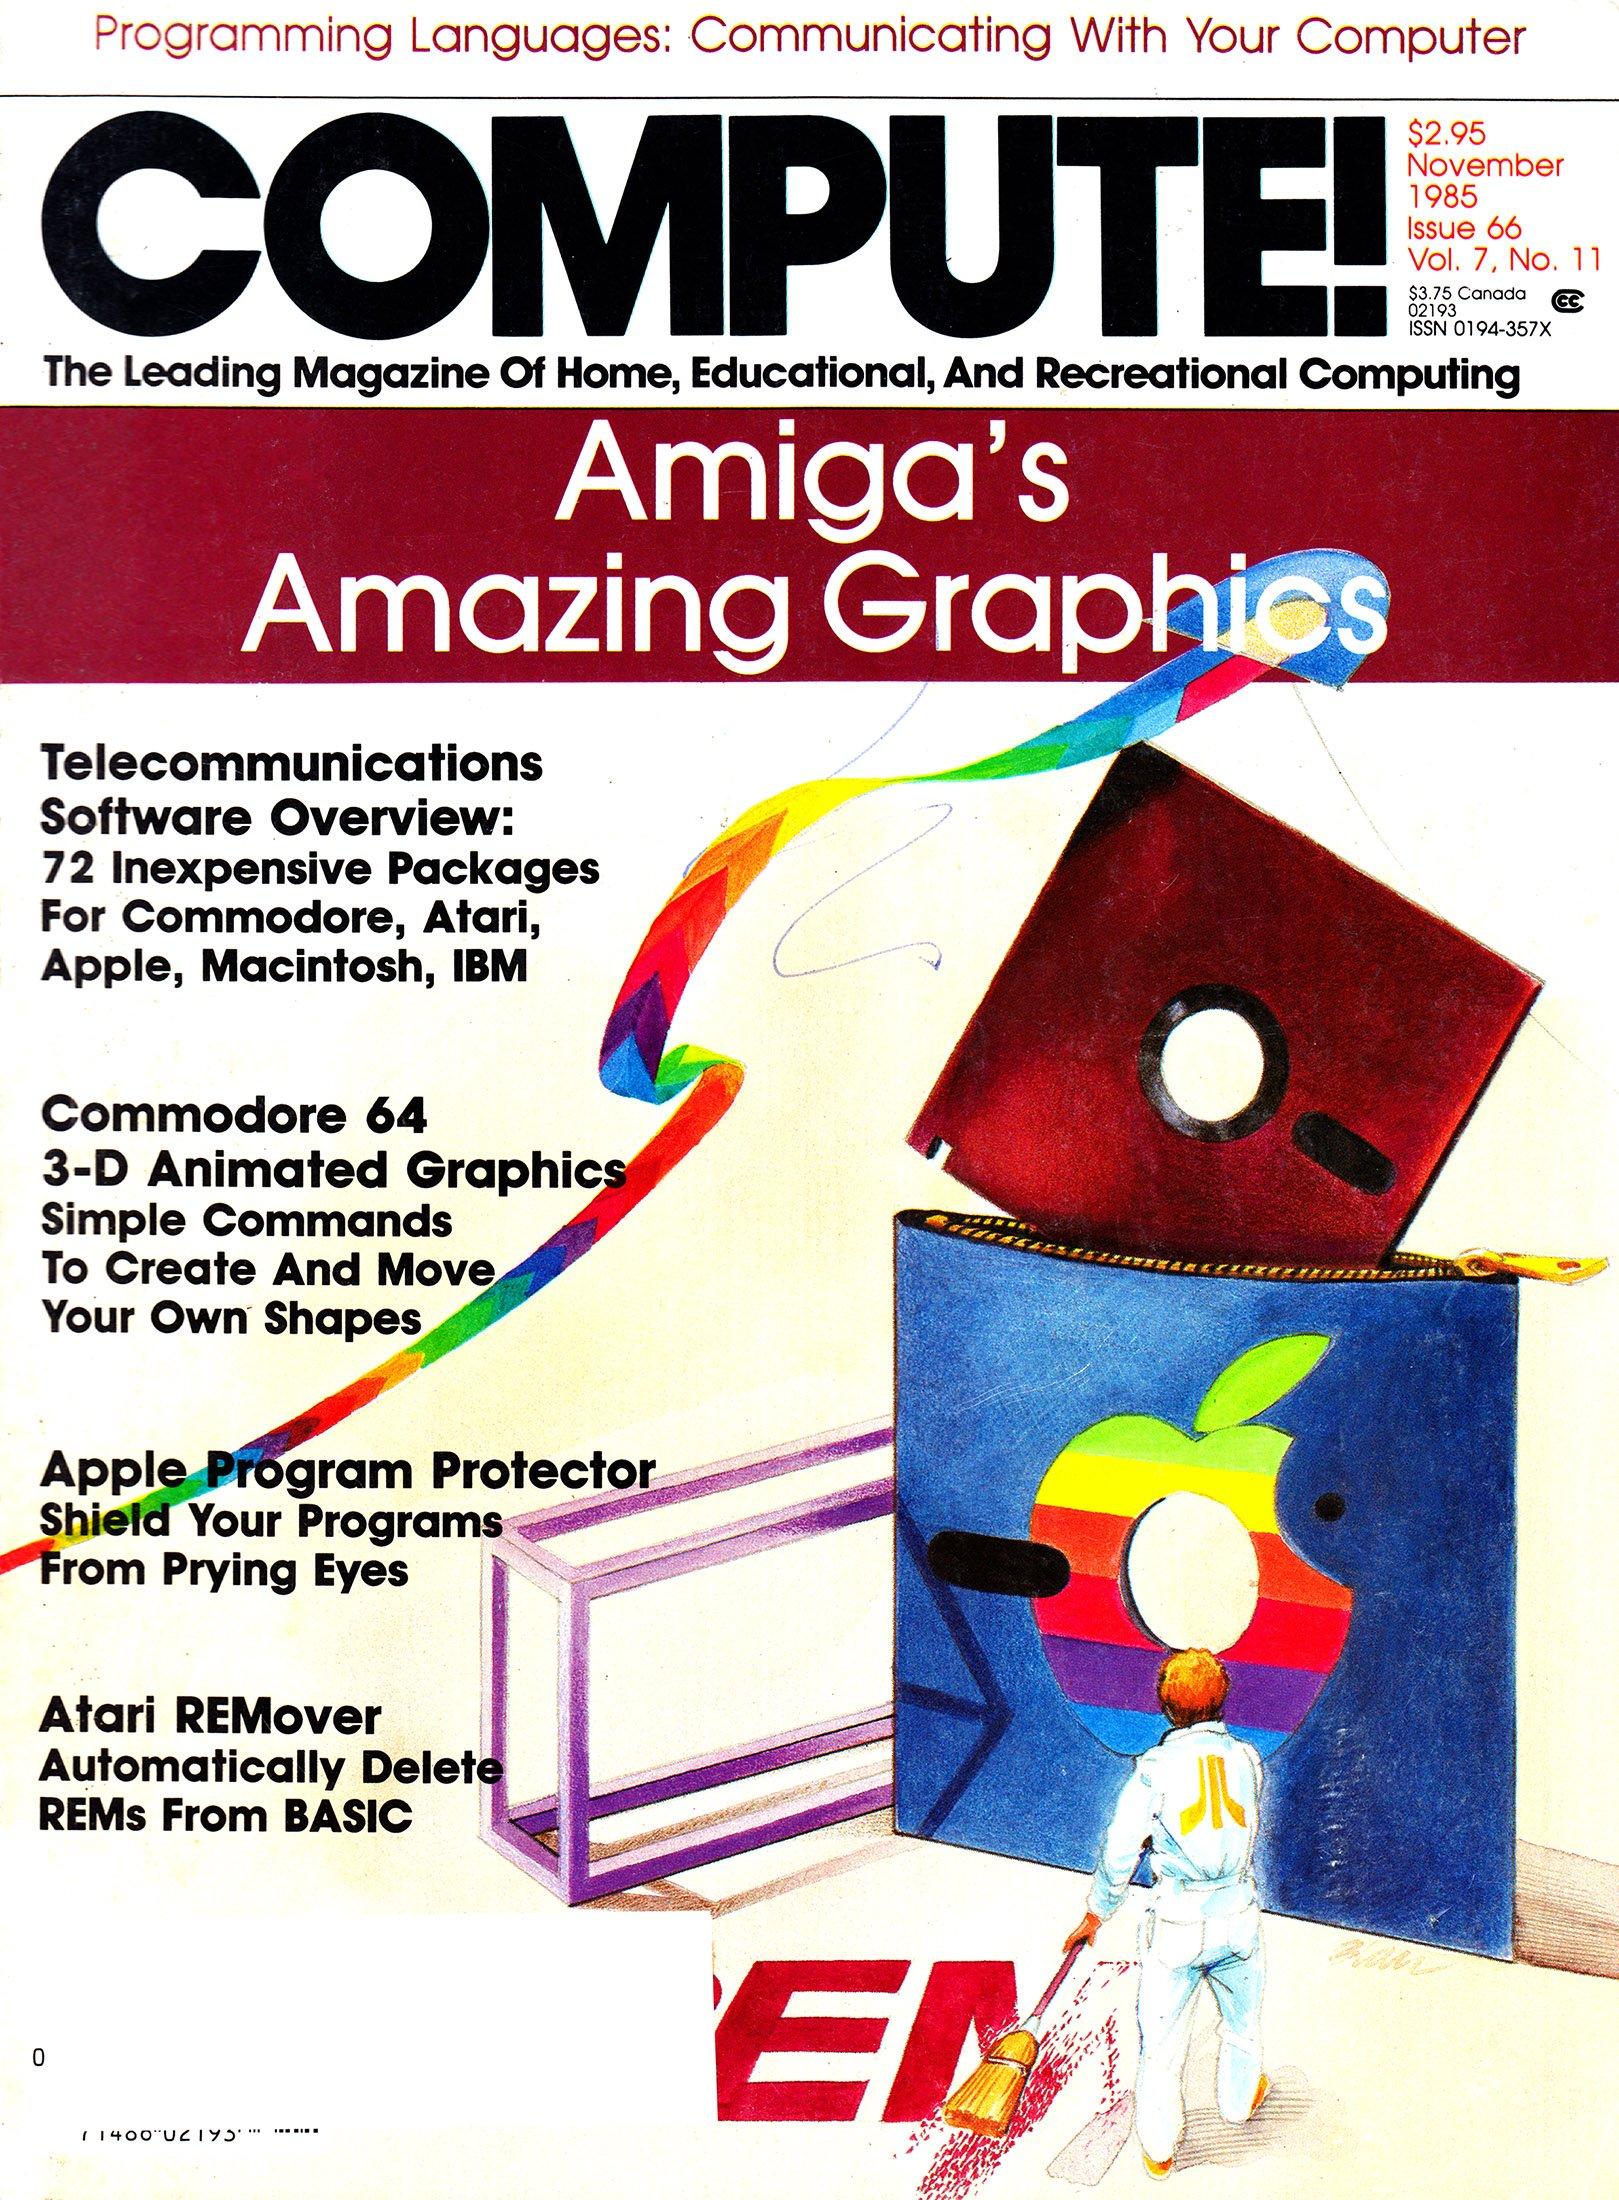 Compute! Issue 066 Vol. 7 No.11 (November 1985)